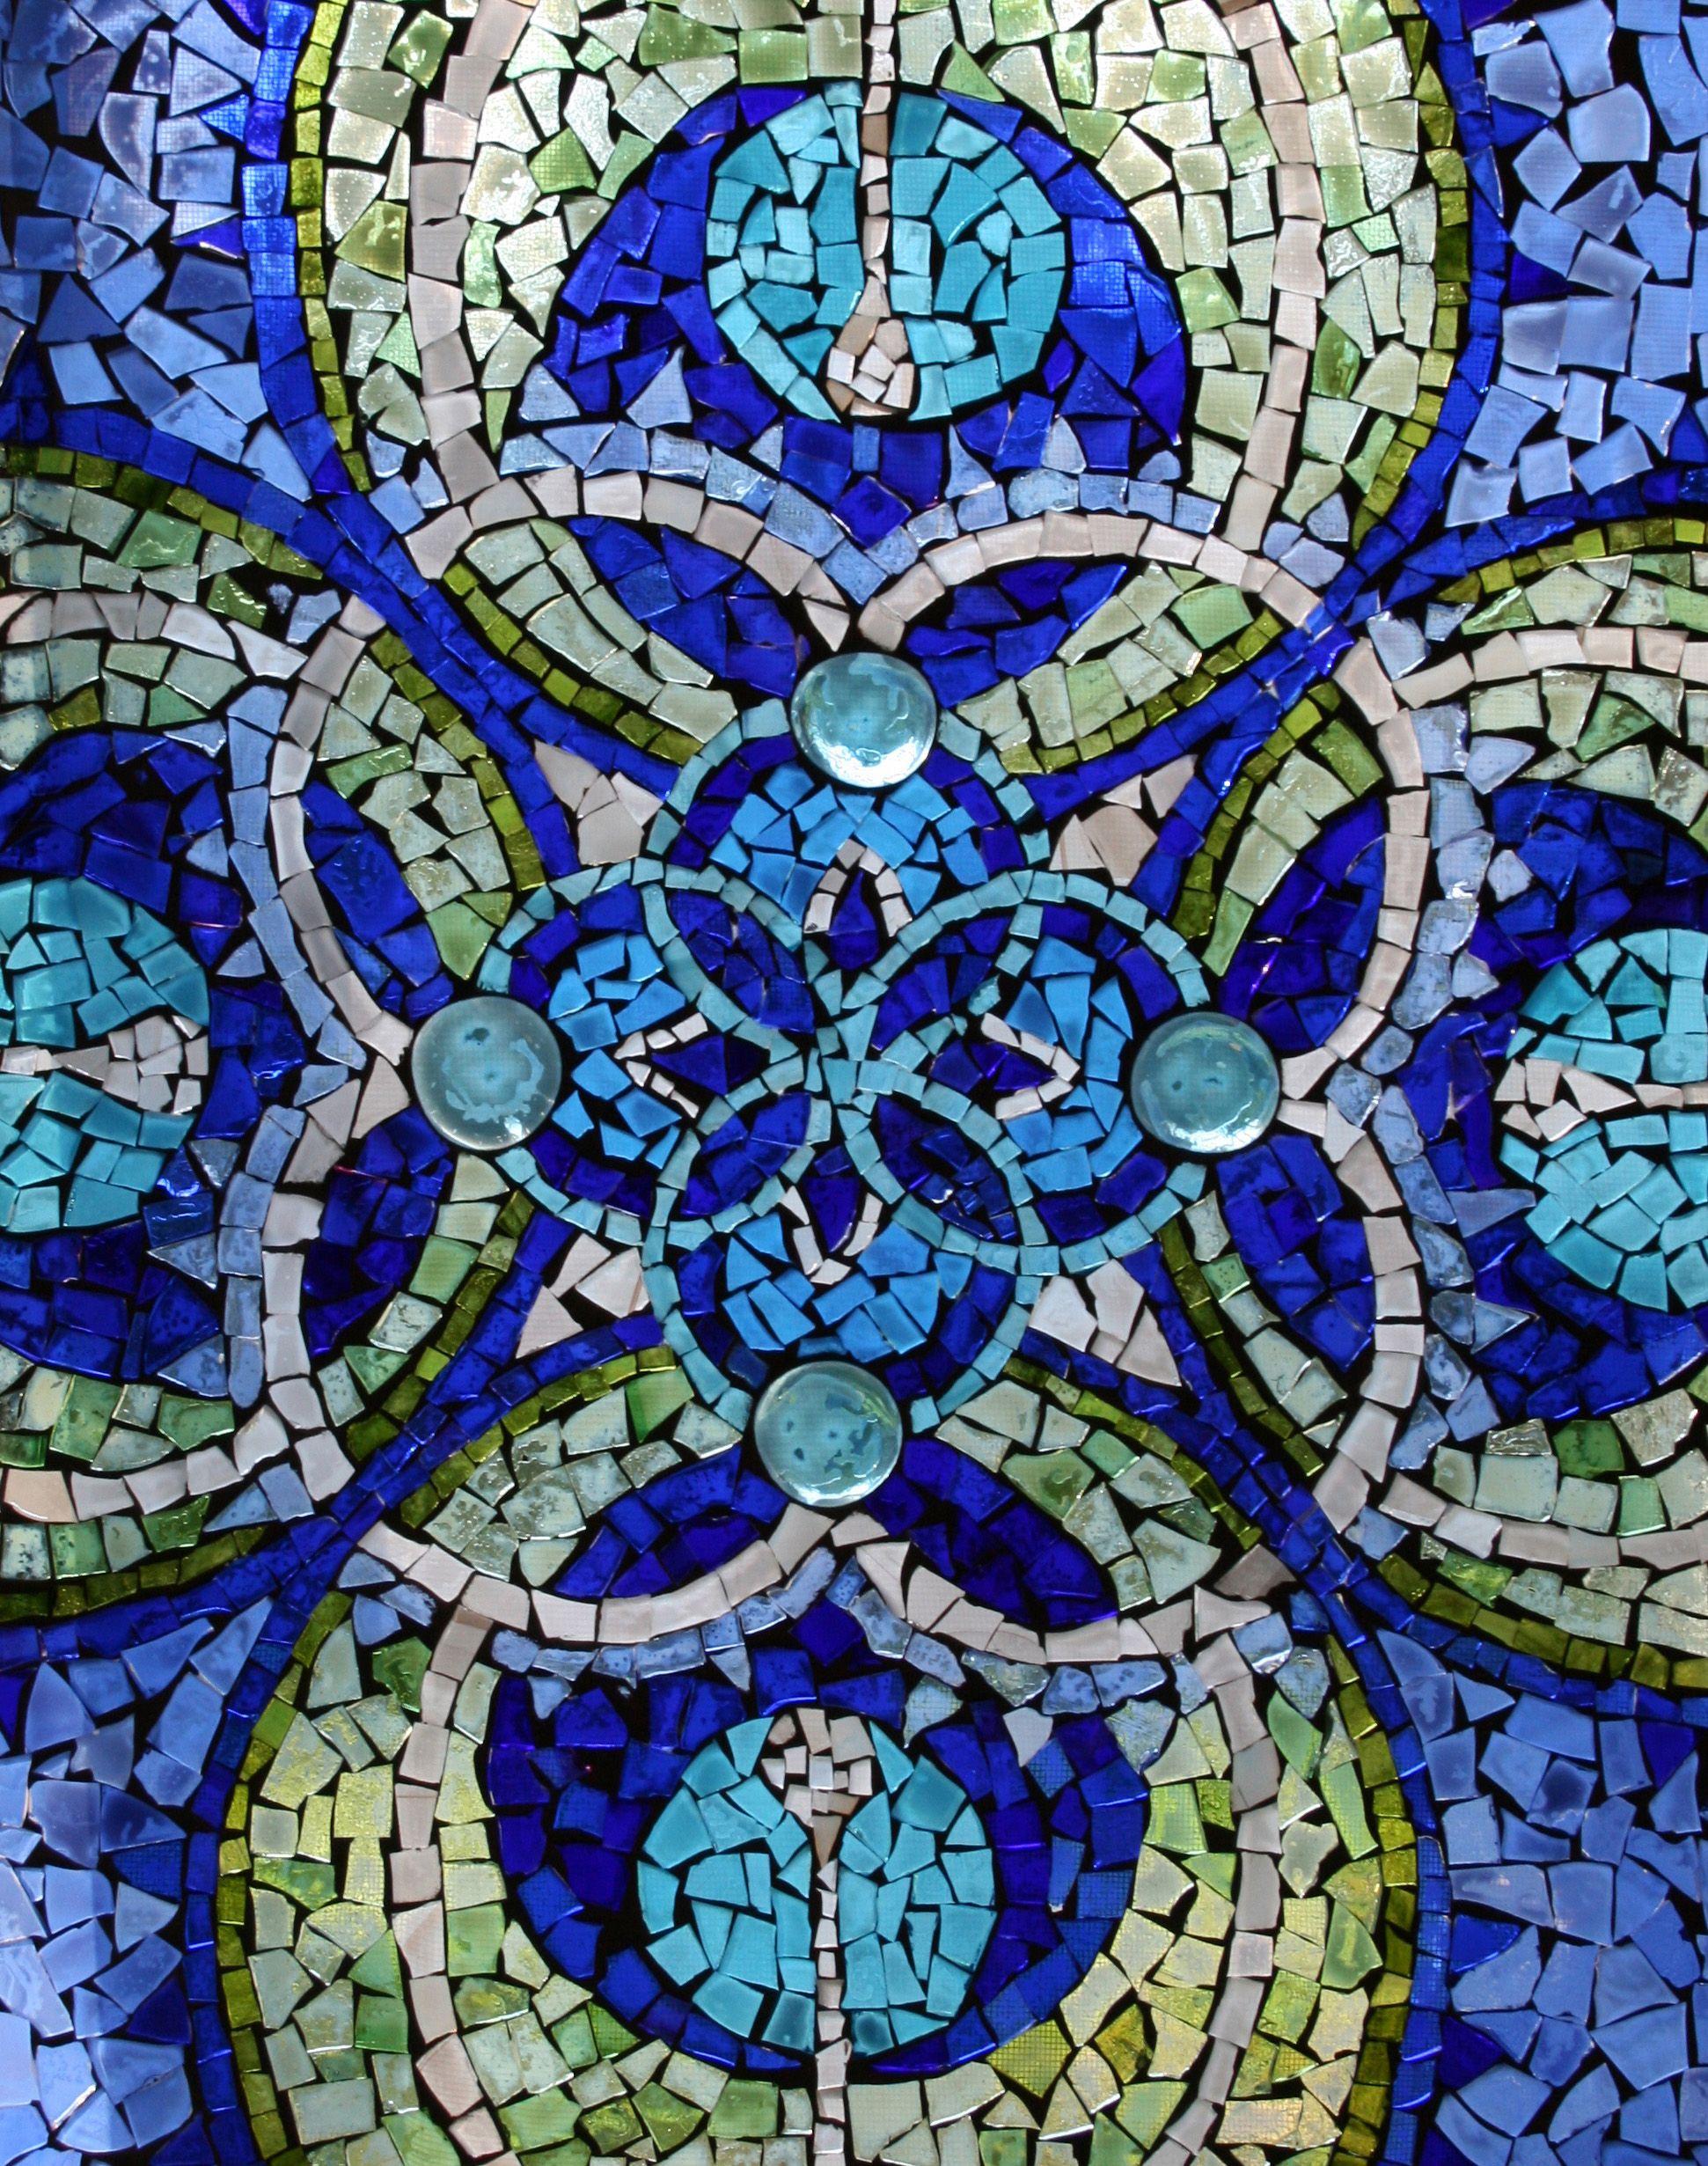 image by: sarah jane gray | mosaics | pinterest | jane gray